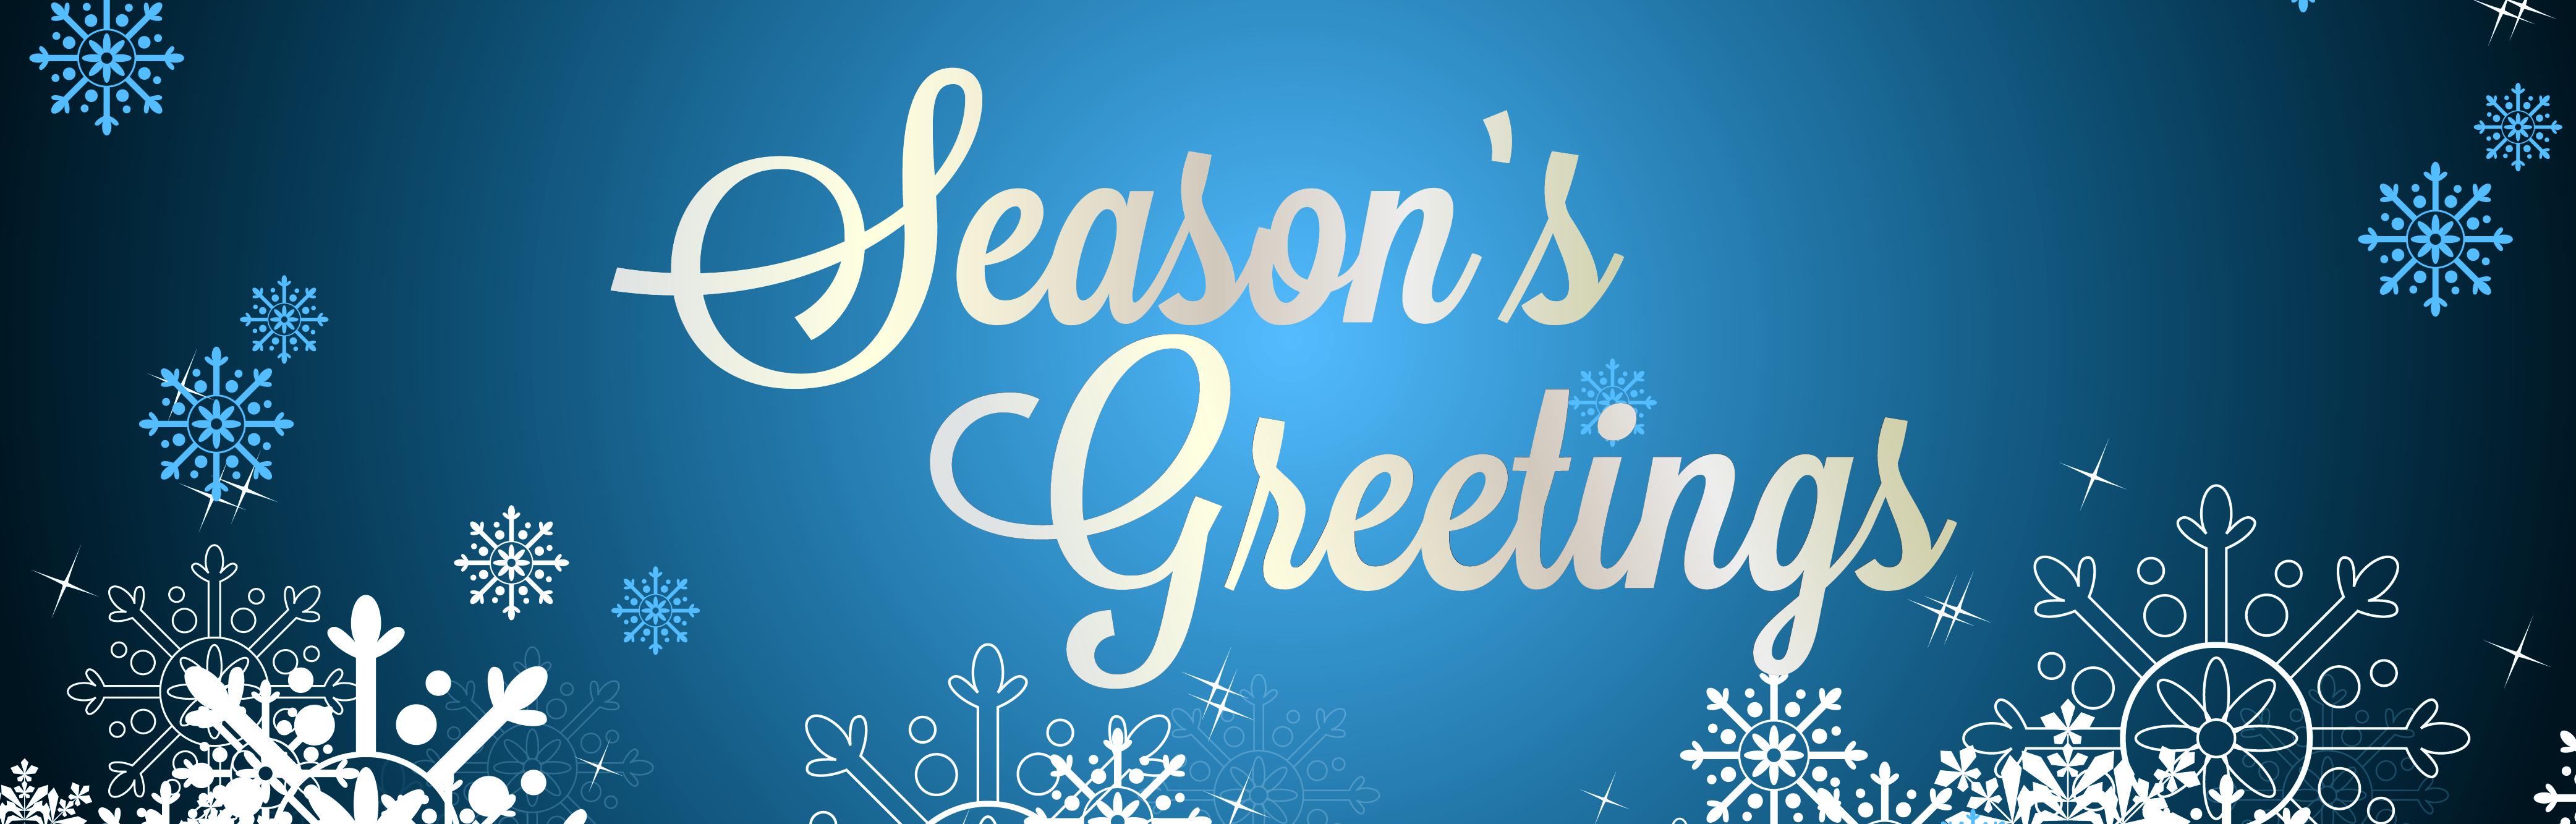 Seasons greetings from ahdi association for healthcare seasons greetings m4hsunfo